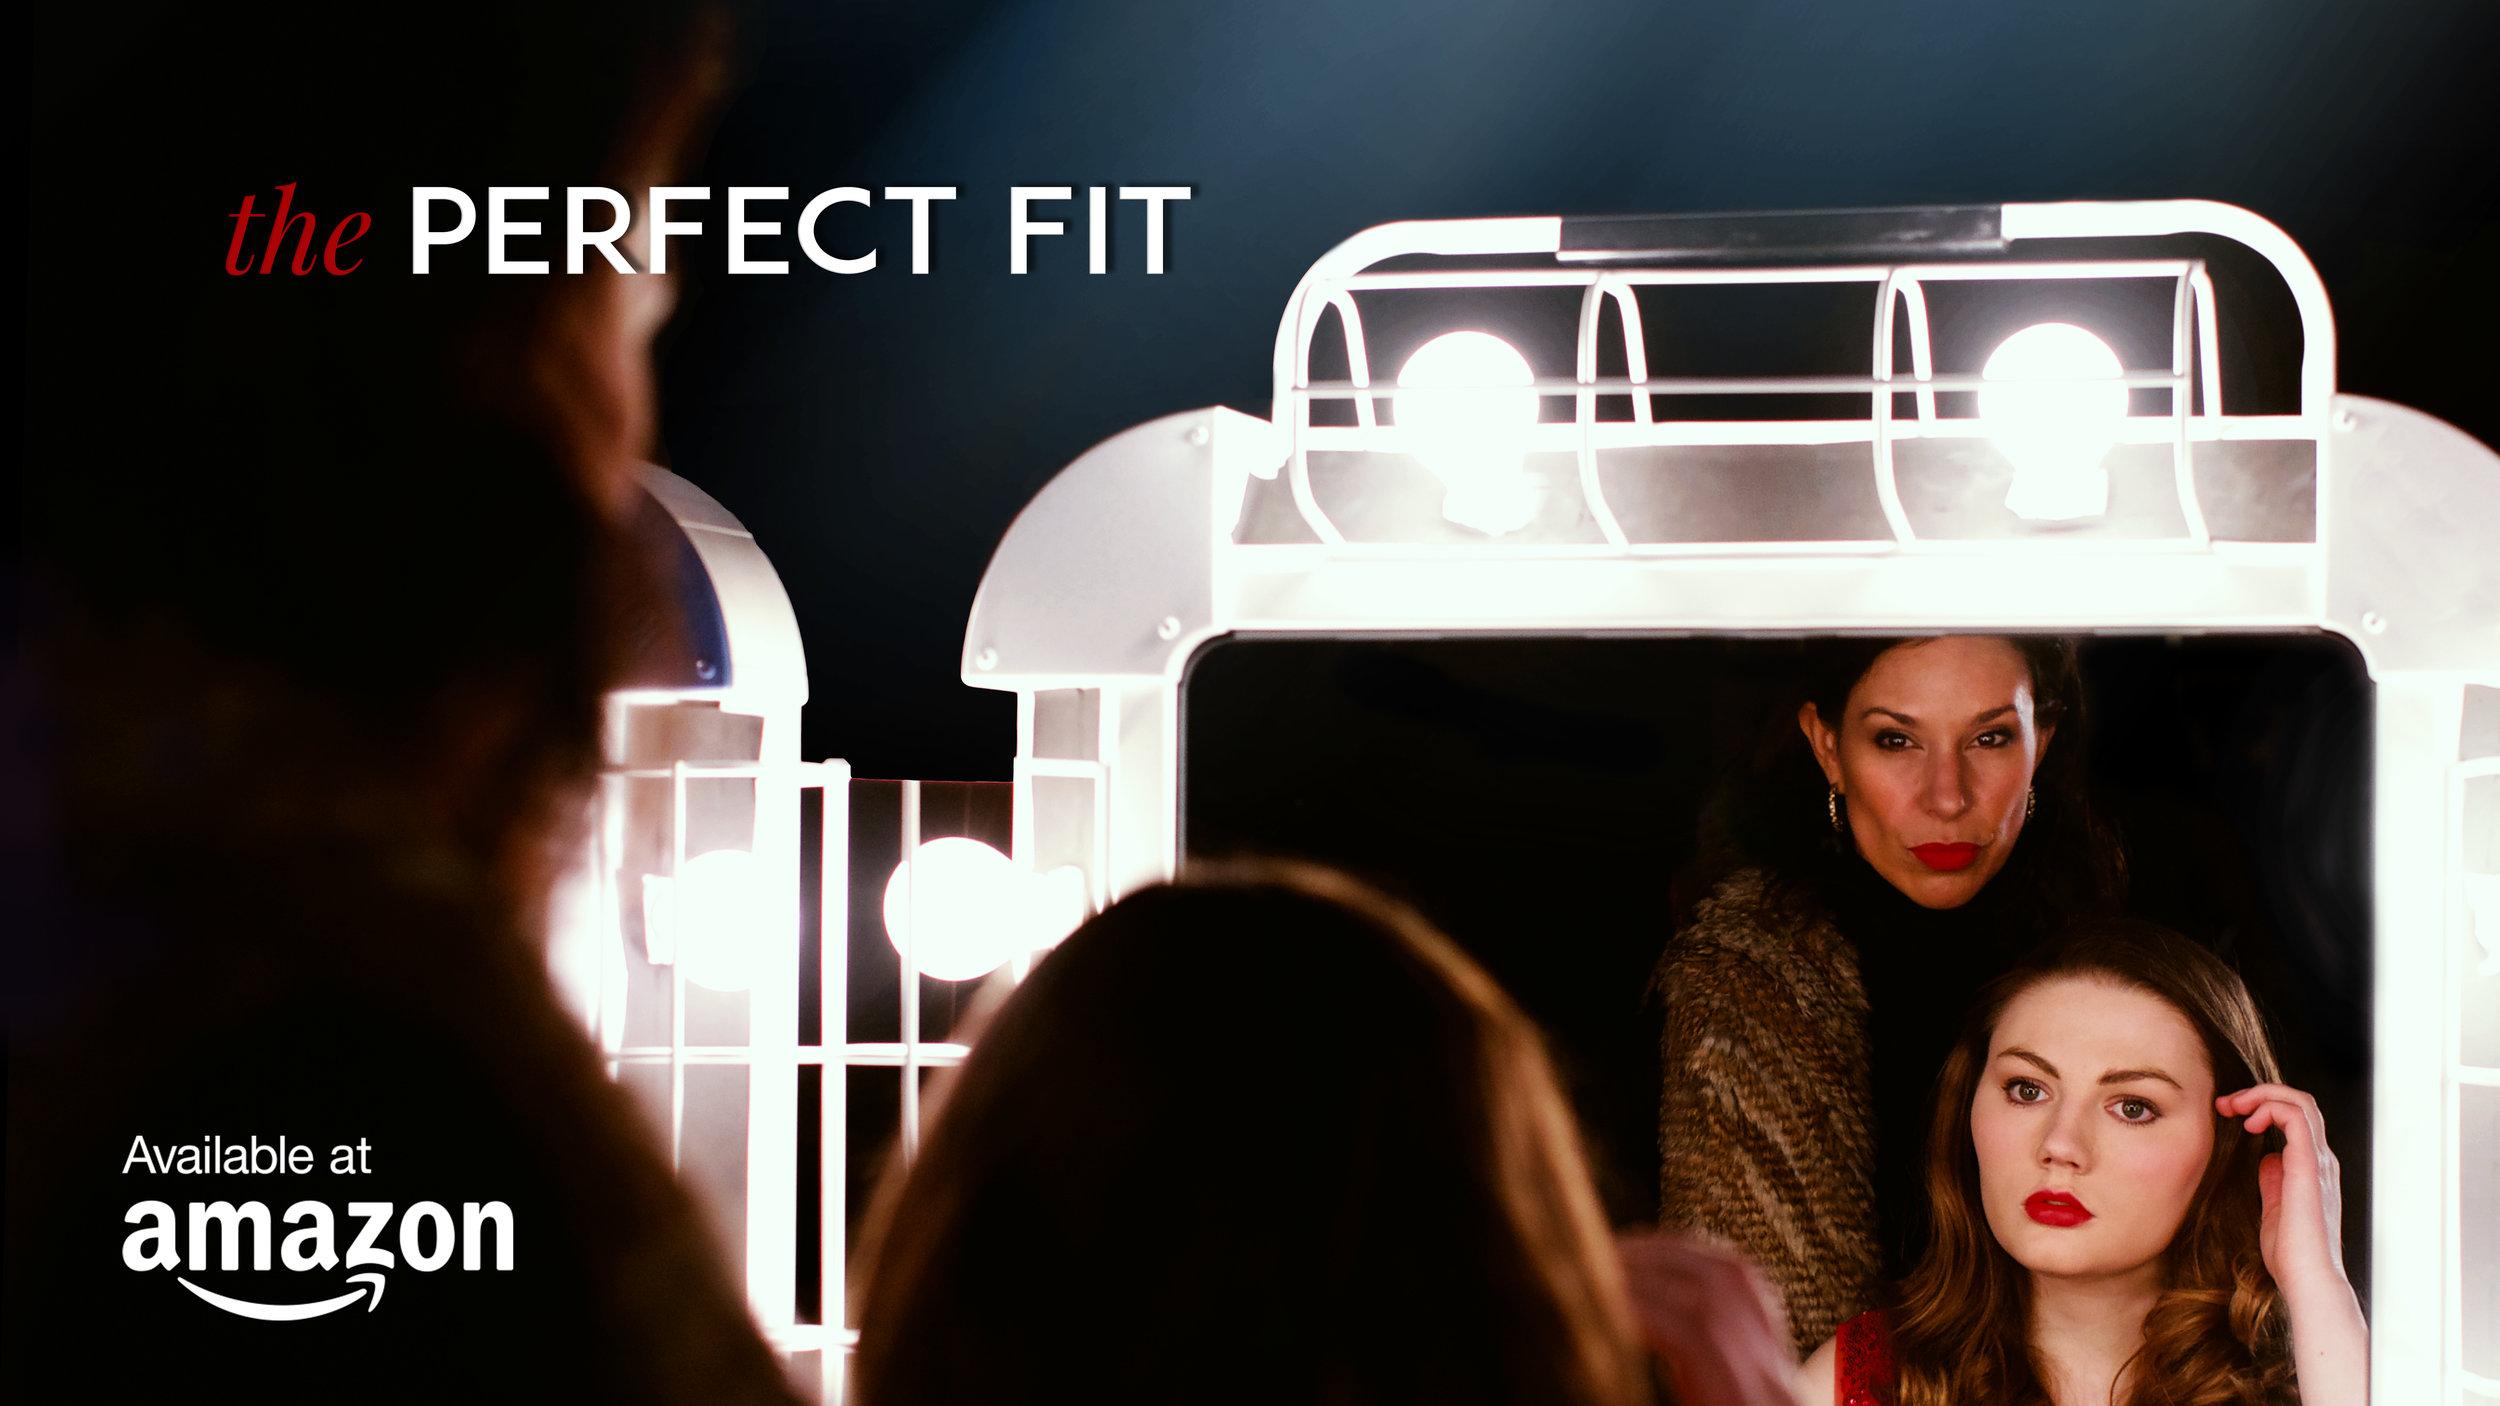 The Perfect Fit Poster Amazon 2 amazon logo.jpg